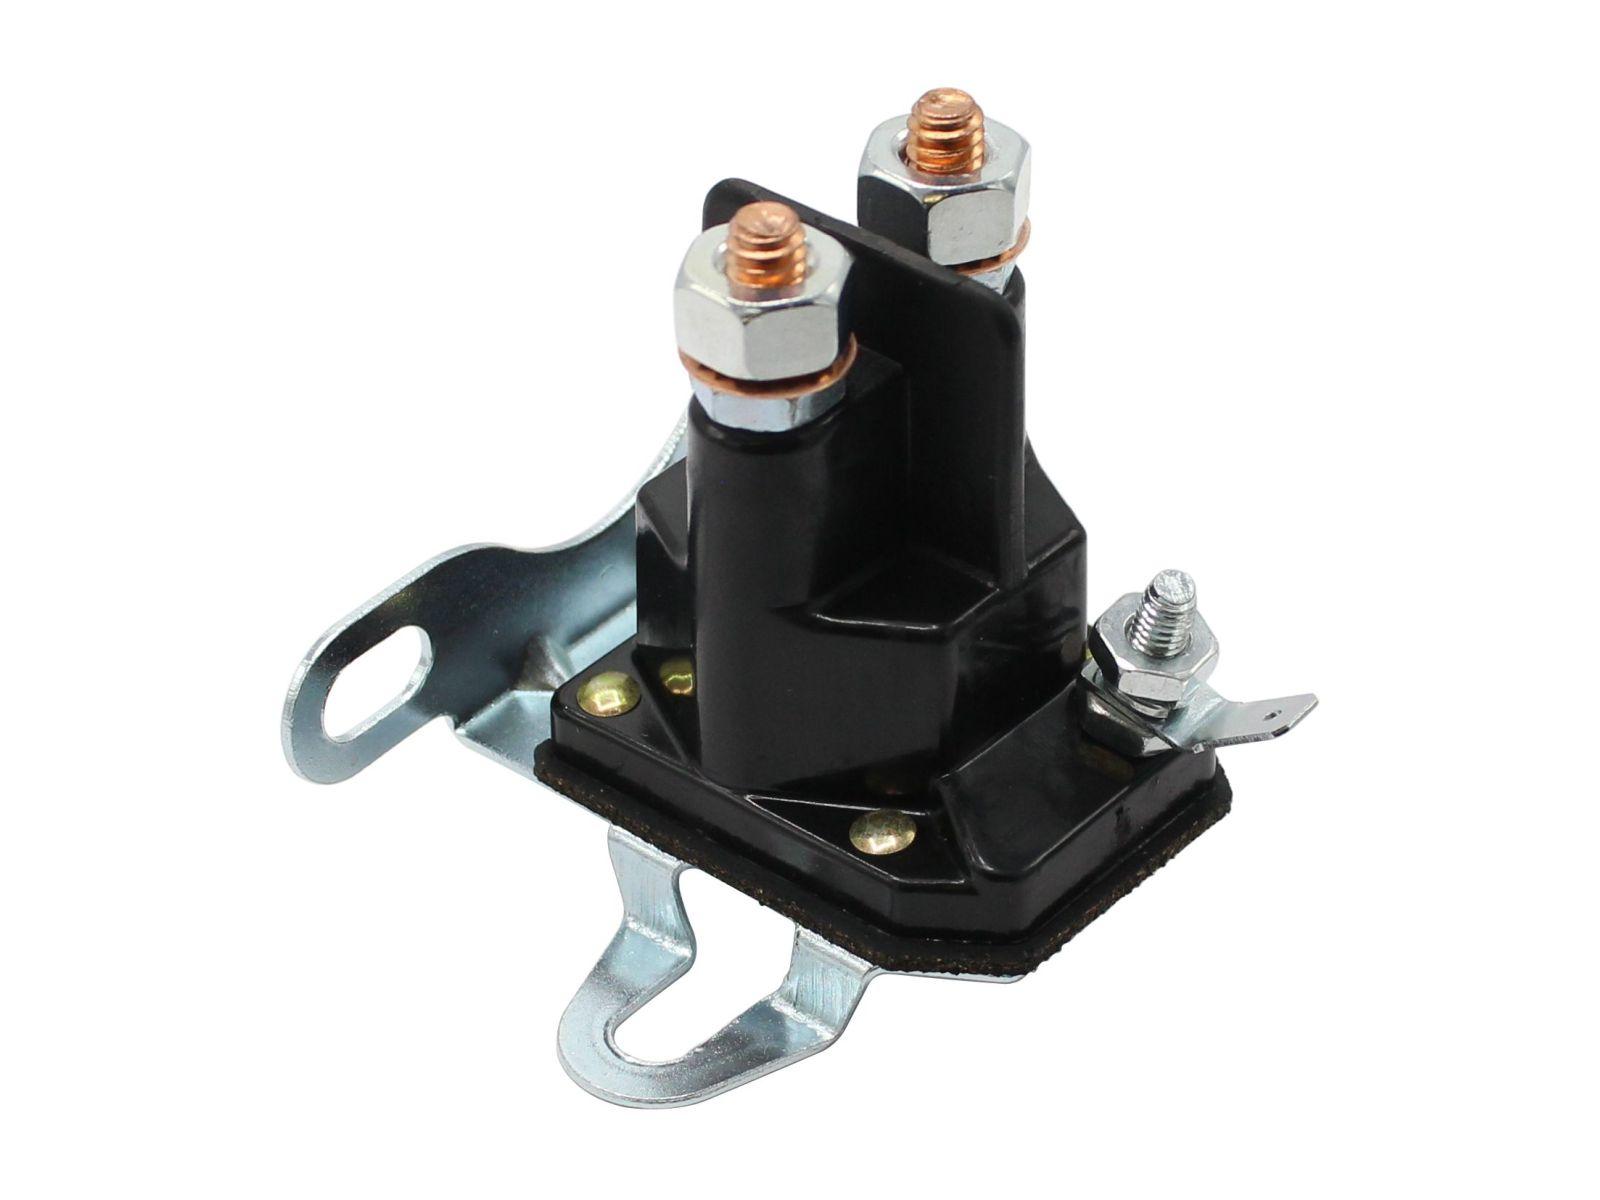 Mulchmessersatz passend CMI 96-125 13AH761F620 Rasentraktor